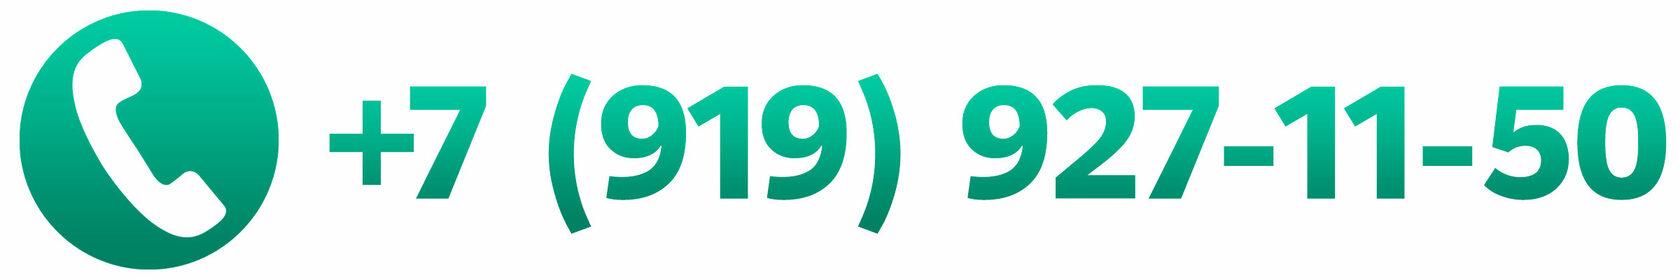 +7 (919) 927-11-50